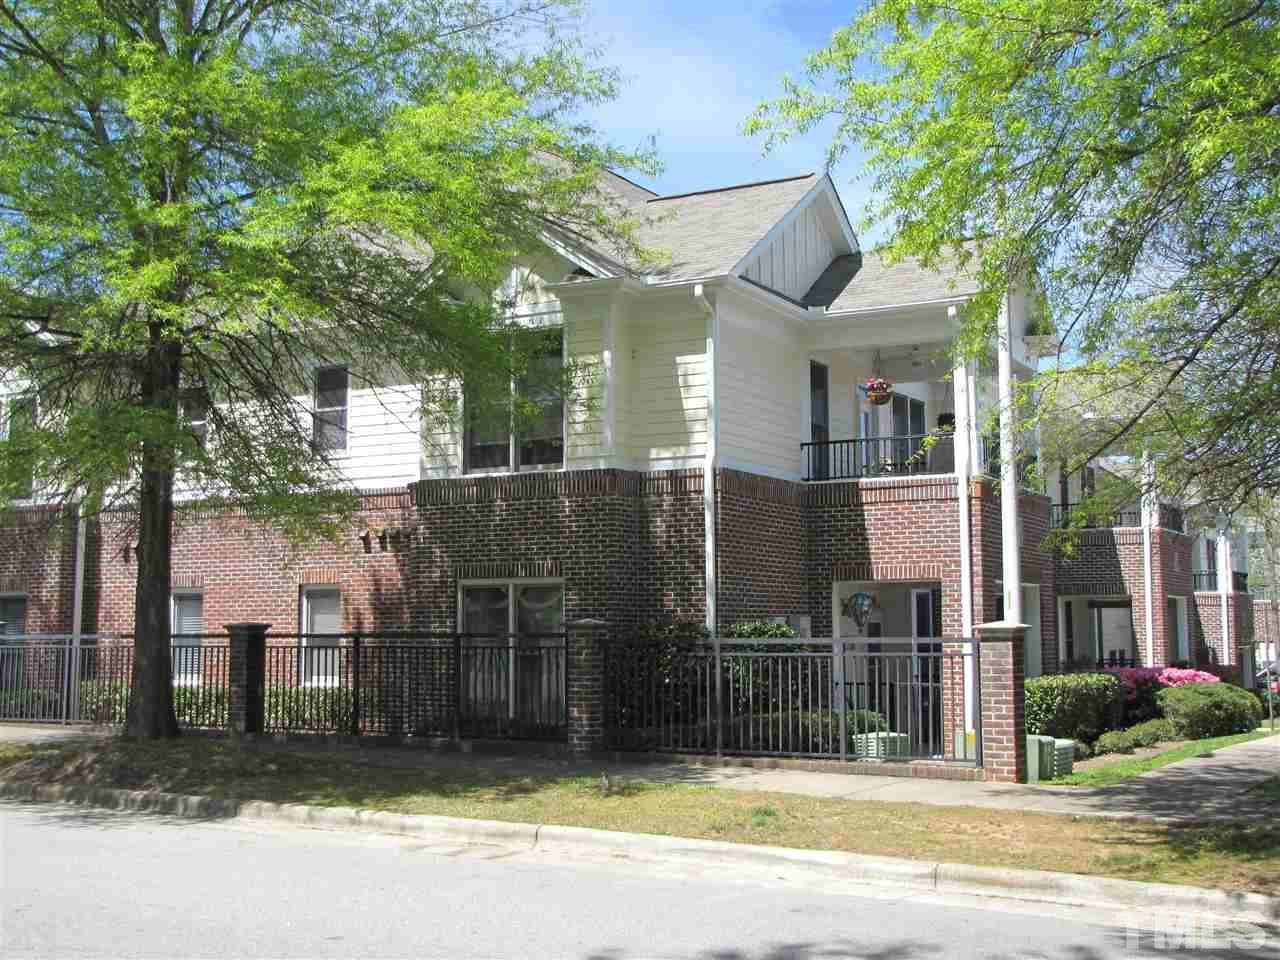 800 Savannah Ridge Road, Holly Springs, NC 27540